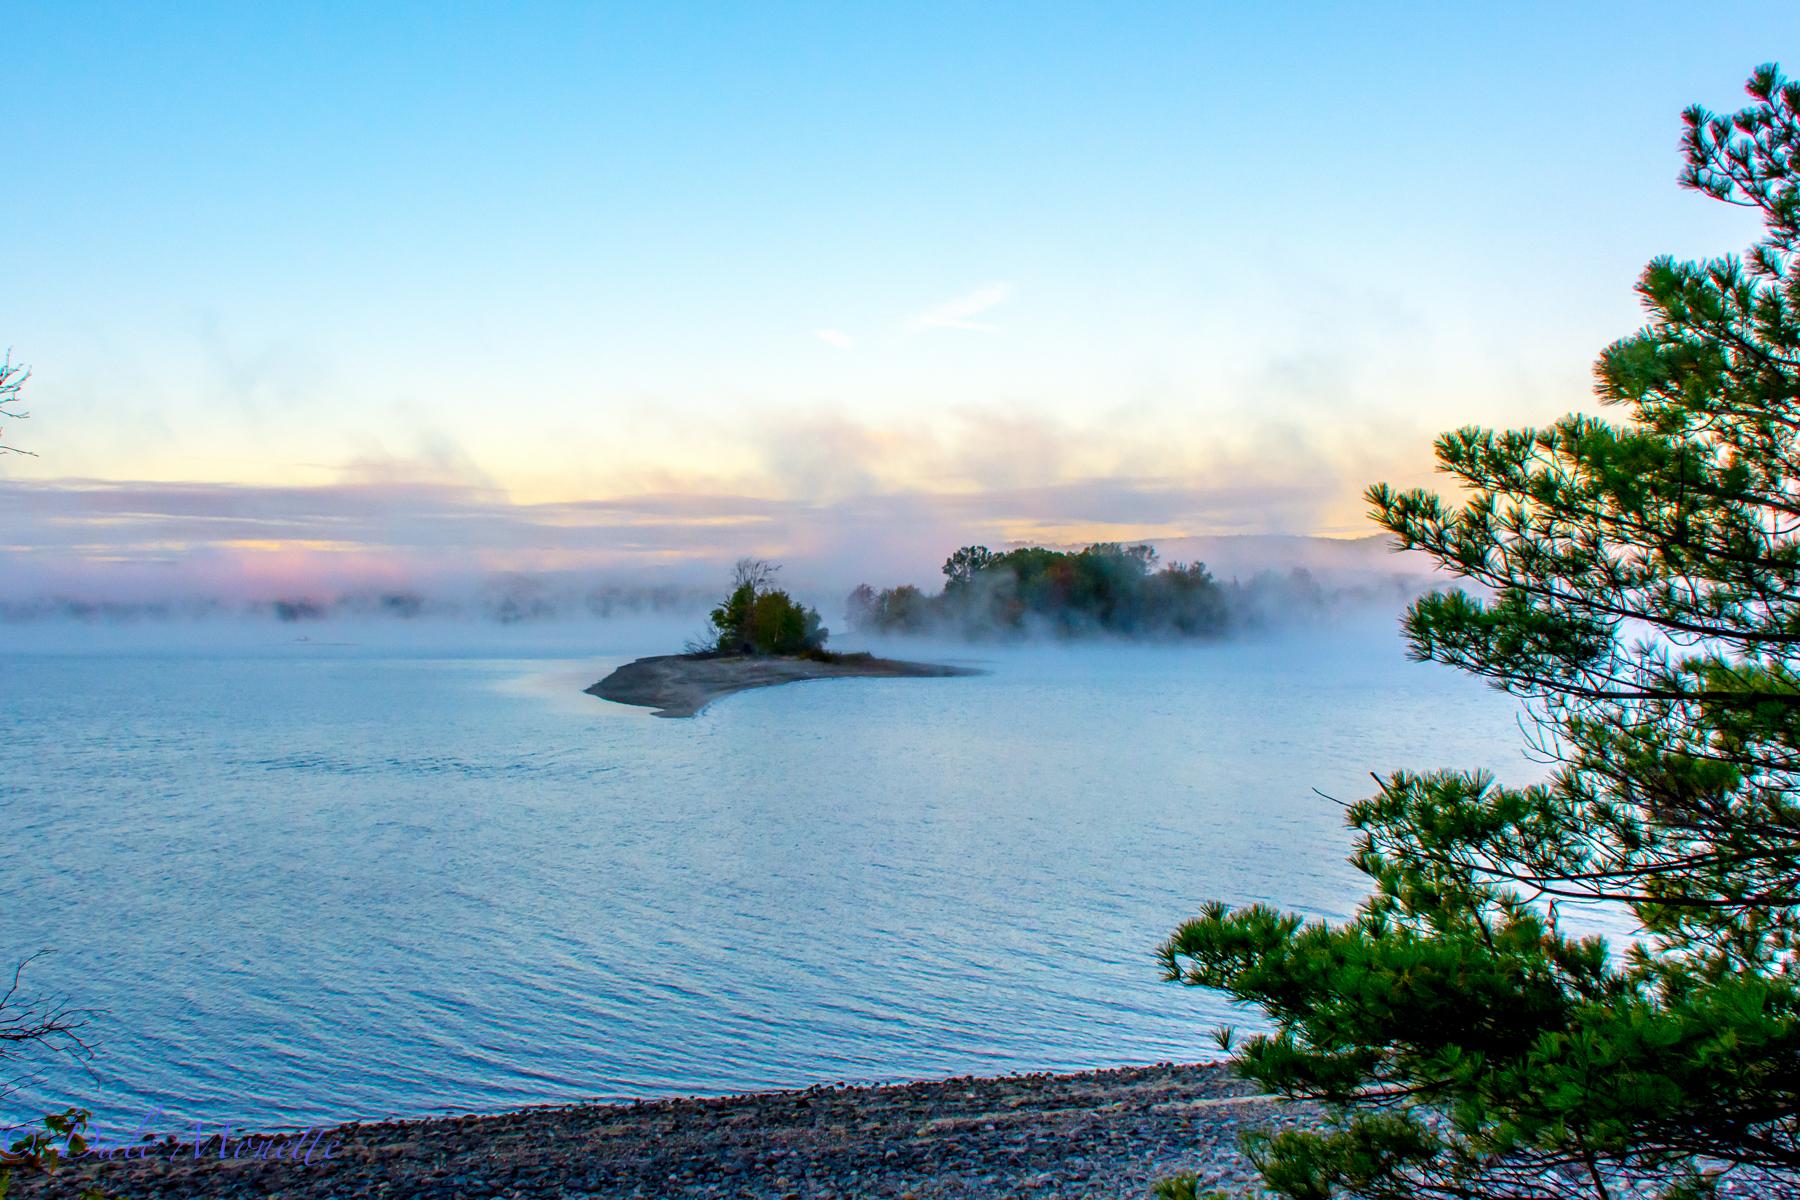 Early morning fog dissipating at Quabbin.   10/6/15